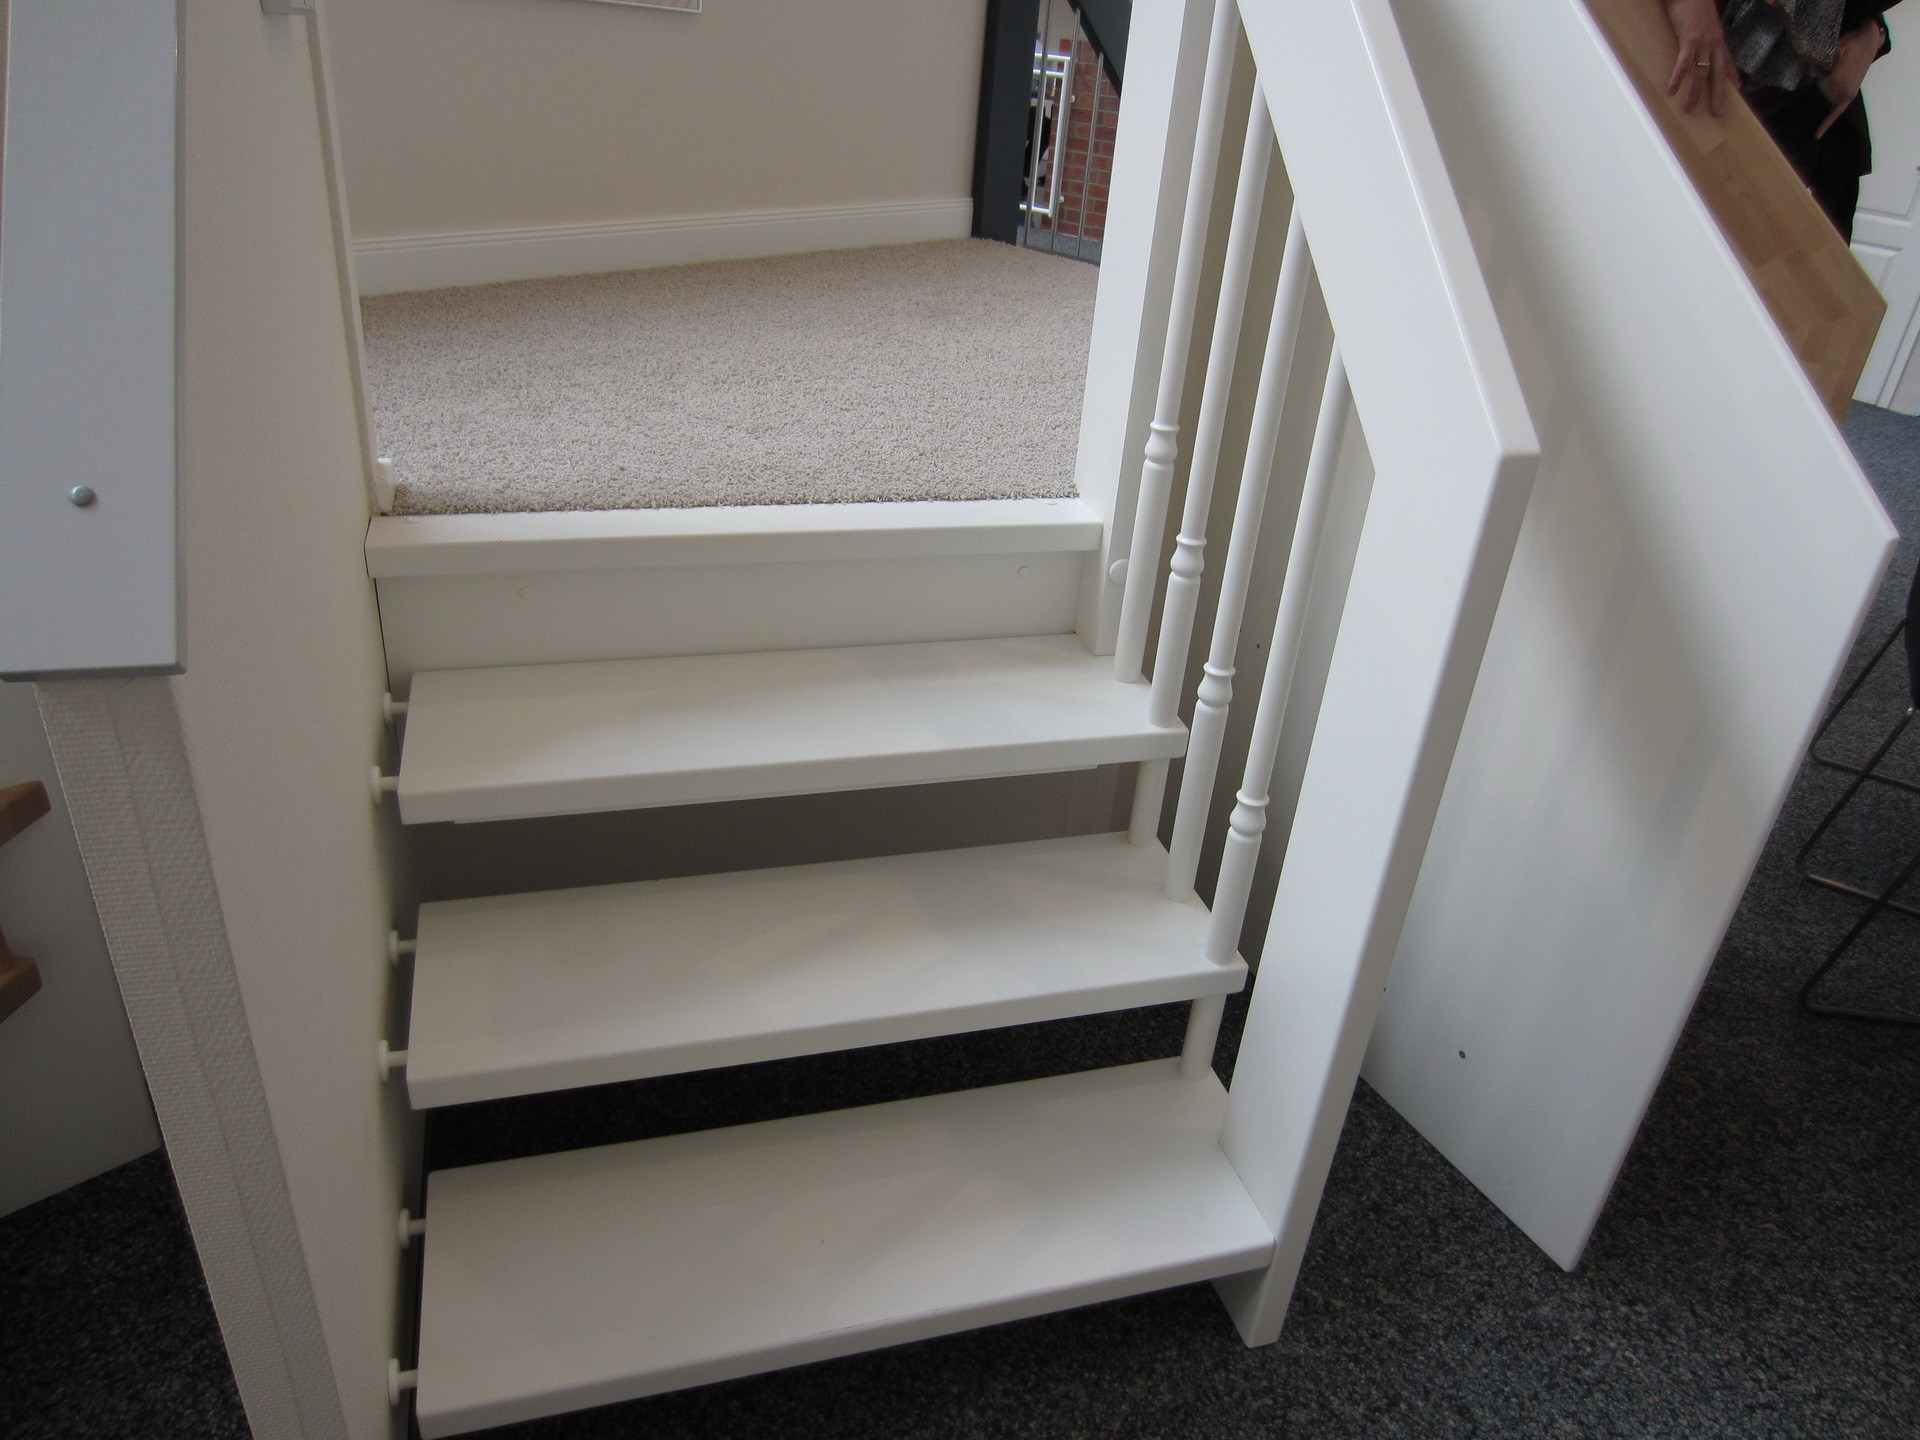 holztreppe wei lackieren treppe weiss mit holz naturbelassen pure flur holztreppe eingestemmt. Black Bedroom Furniture Sets. Home Design Ideas